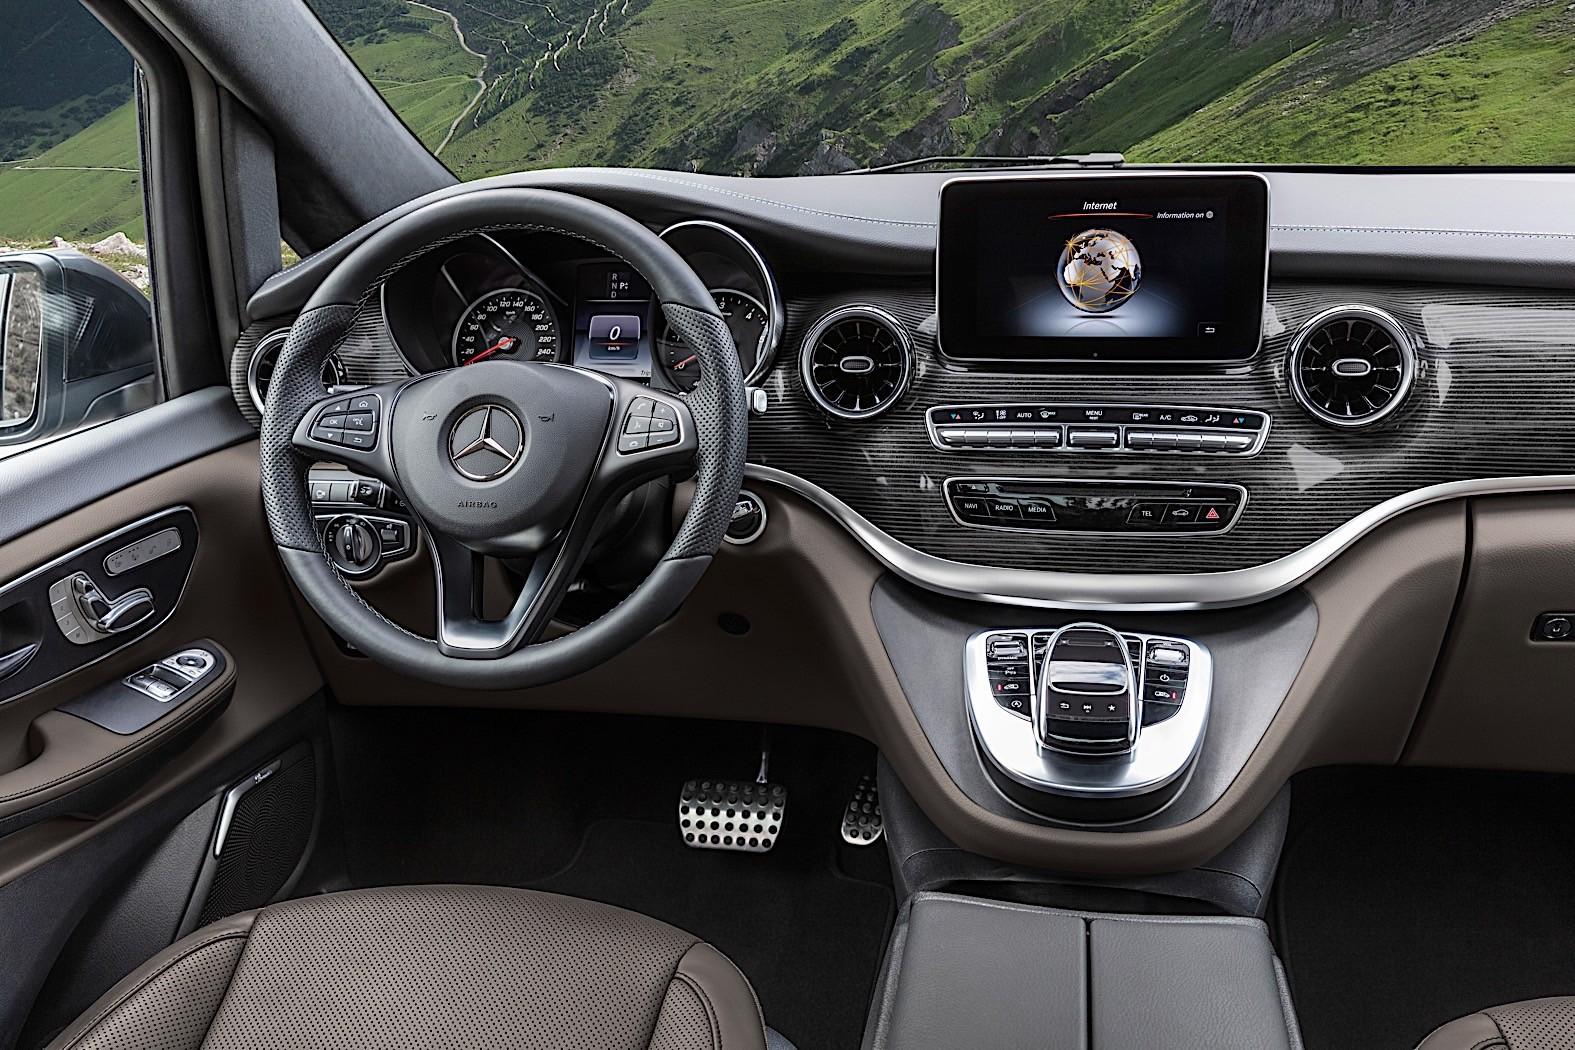 2020 mercedes-benz v-class facelift breaks cover